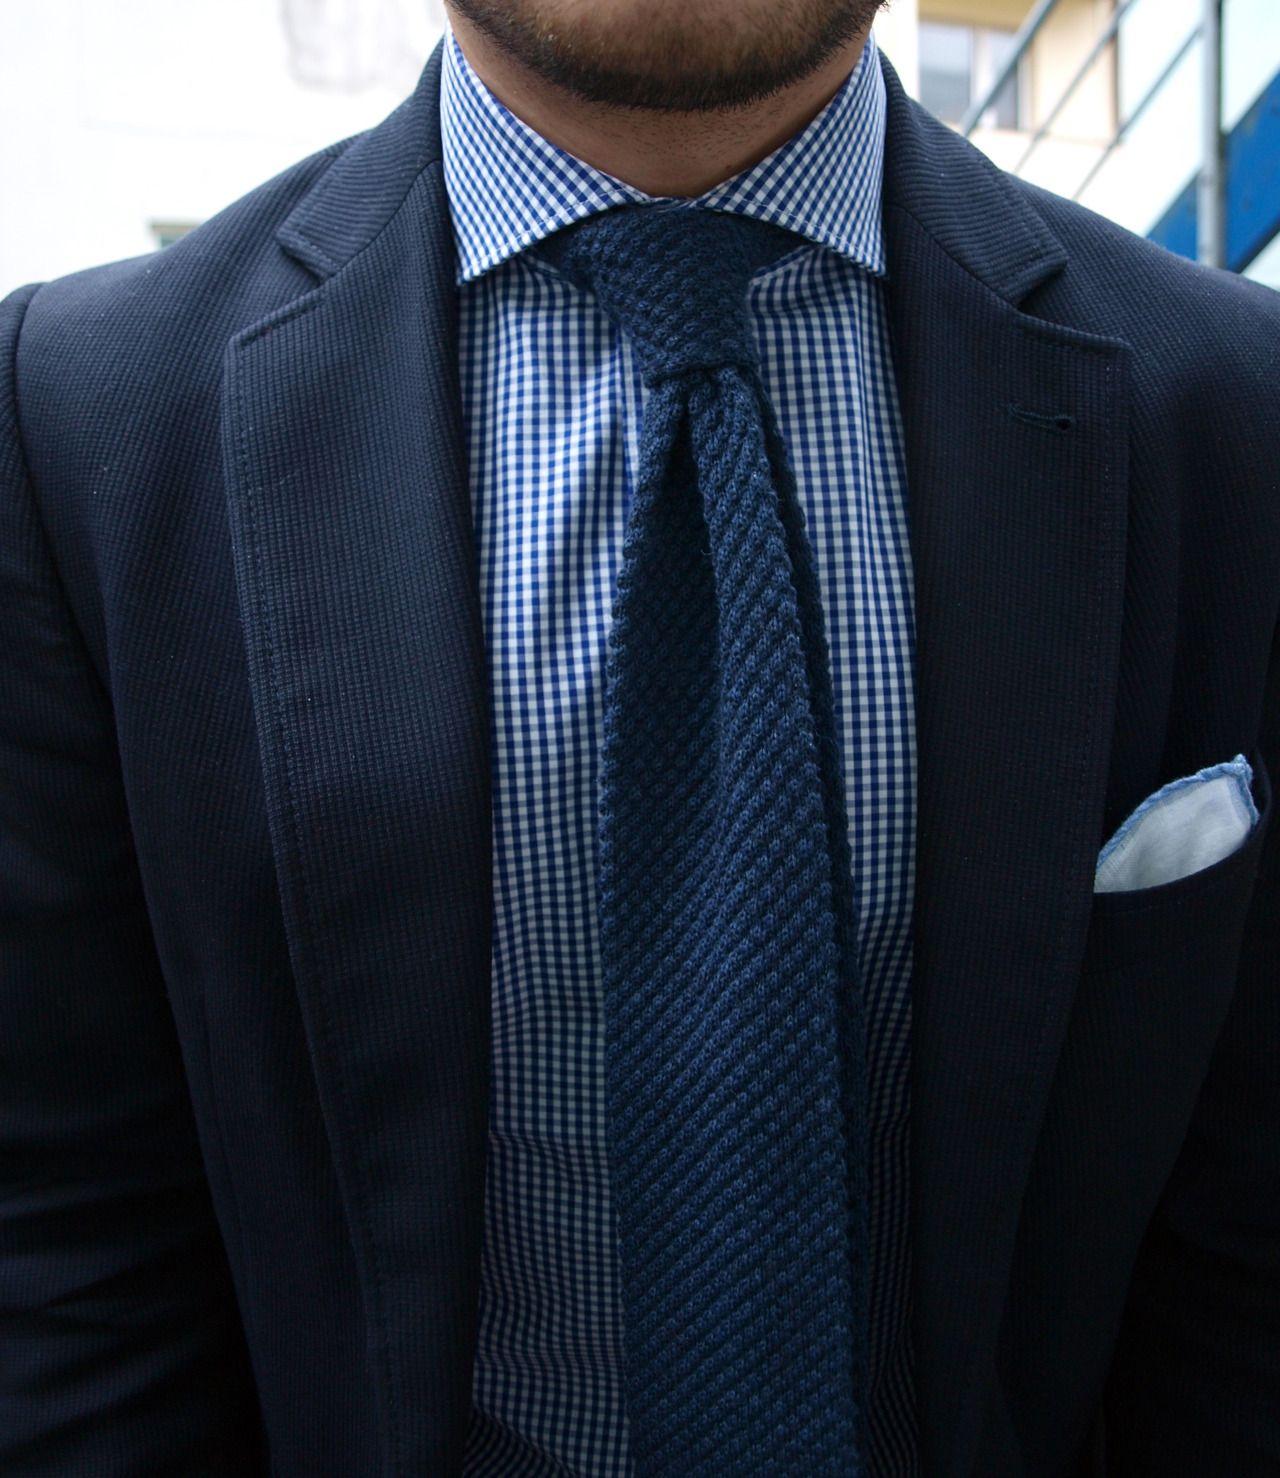 Blue Knit Tie | My style for men Fashion | Pinterest ...